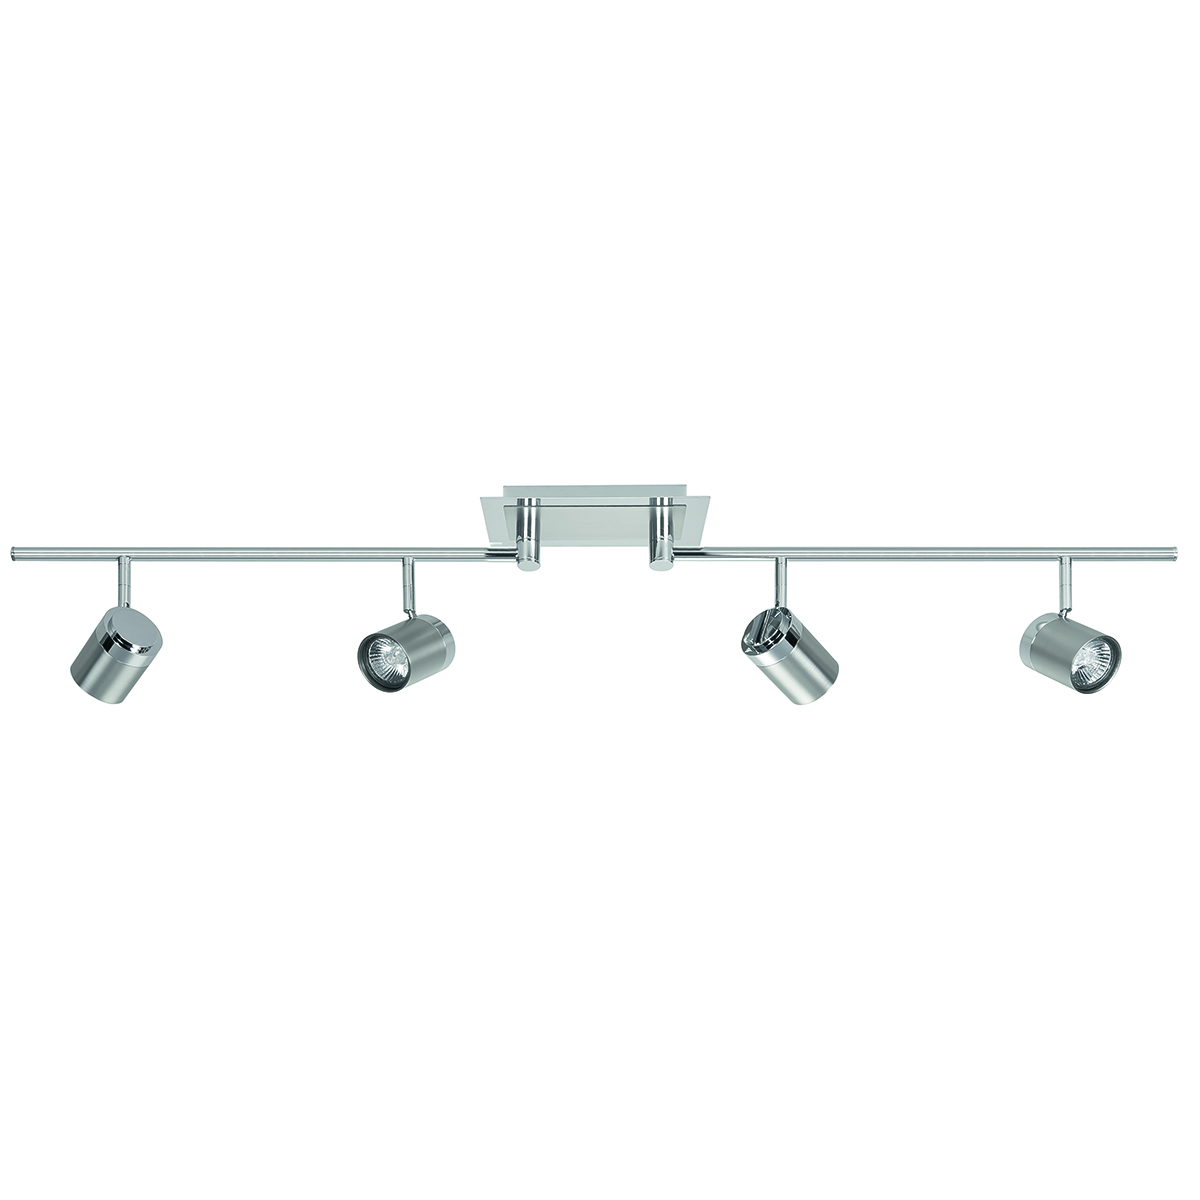 Athena spot 4-lichts - plafondlamp met vier spots - GU10 mobiel  Nikkel-Mat + Chroom zonder lampen - Serie Athena - Spots - High Light - S738930